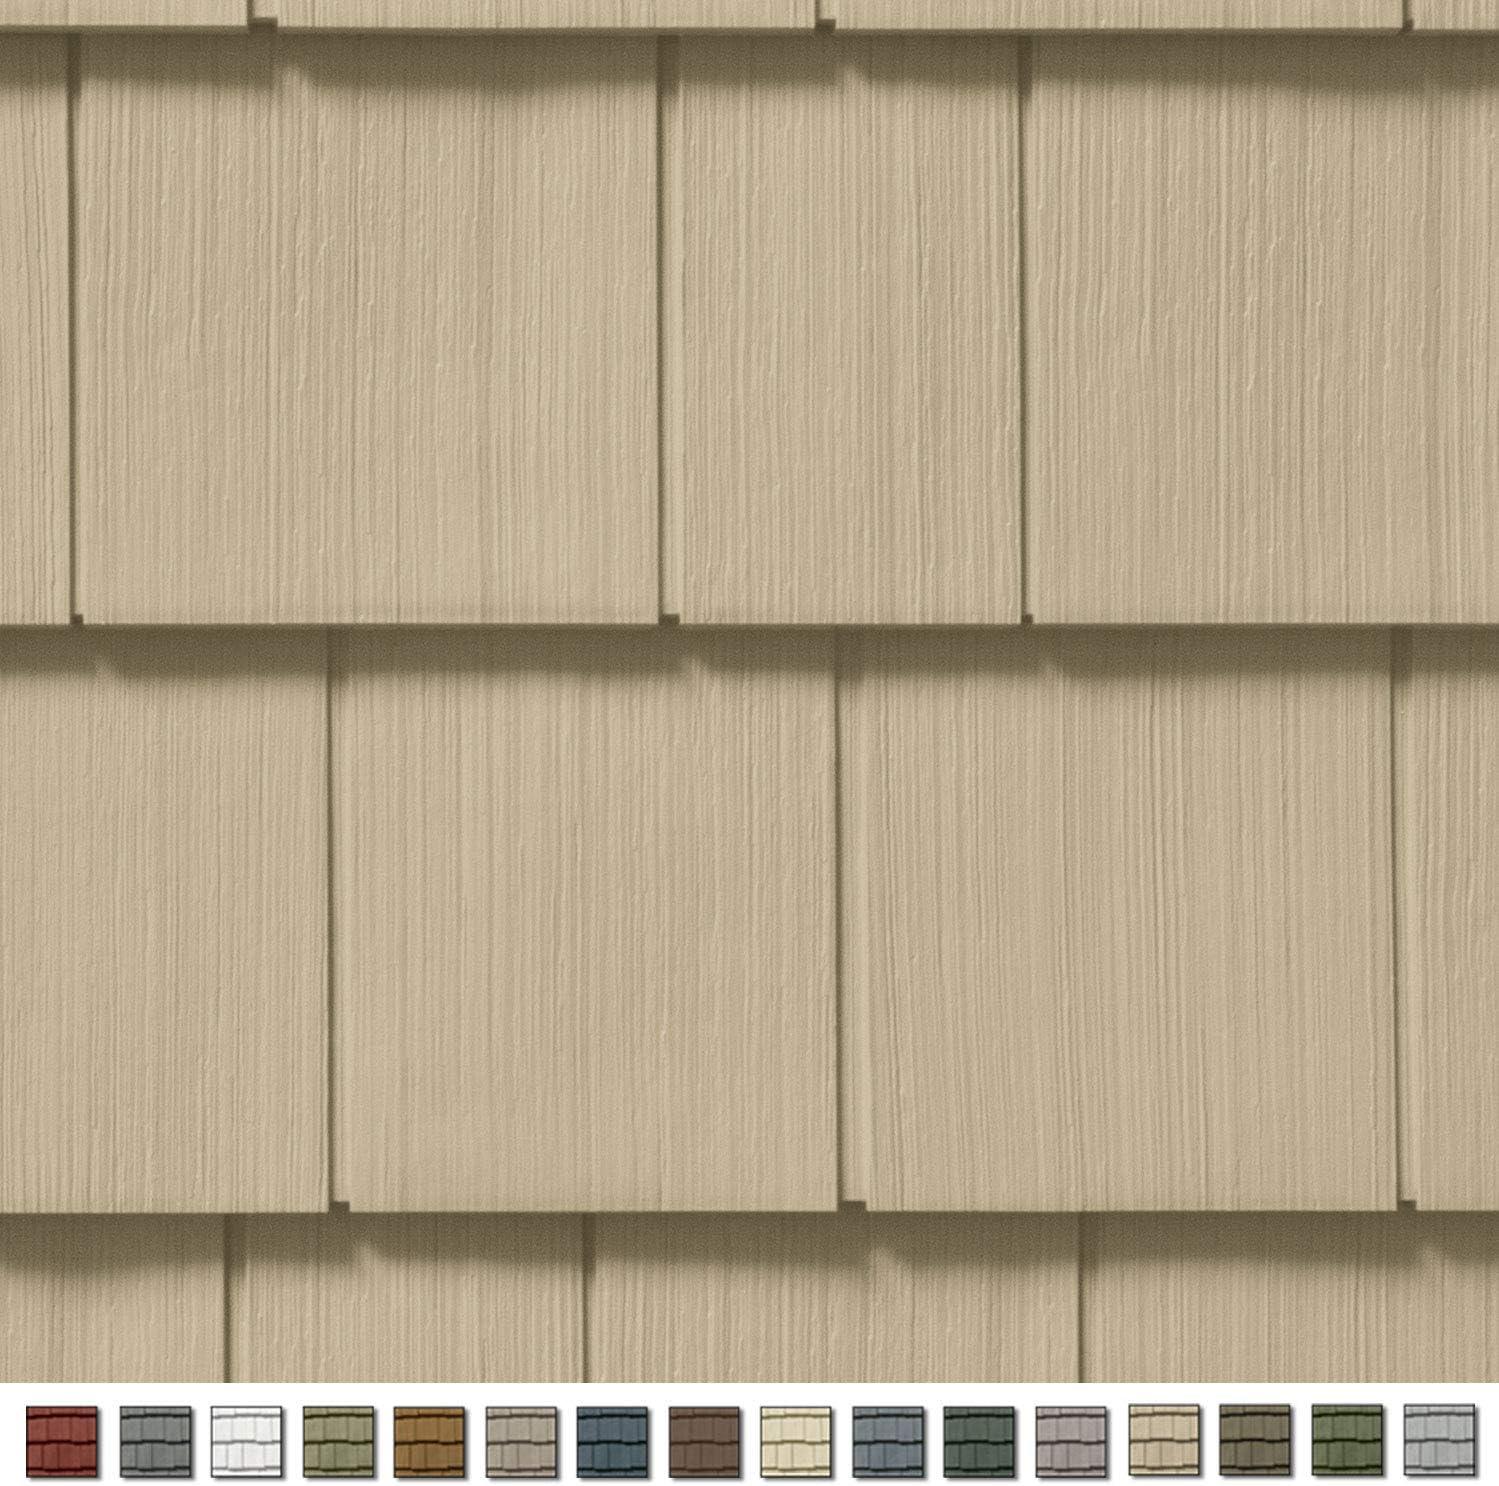 Cedar Impressions Double 7in. Straight Edge Perfection Shingles Siding (1/2 Square) Savannah Wicker